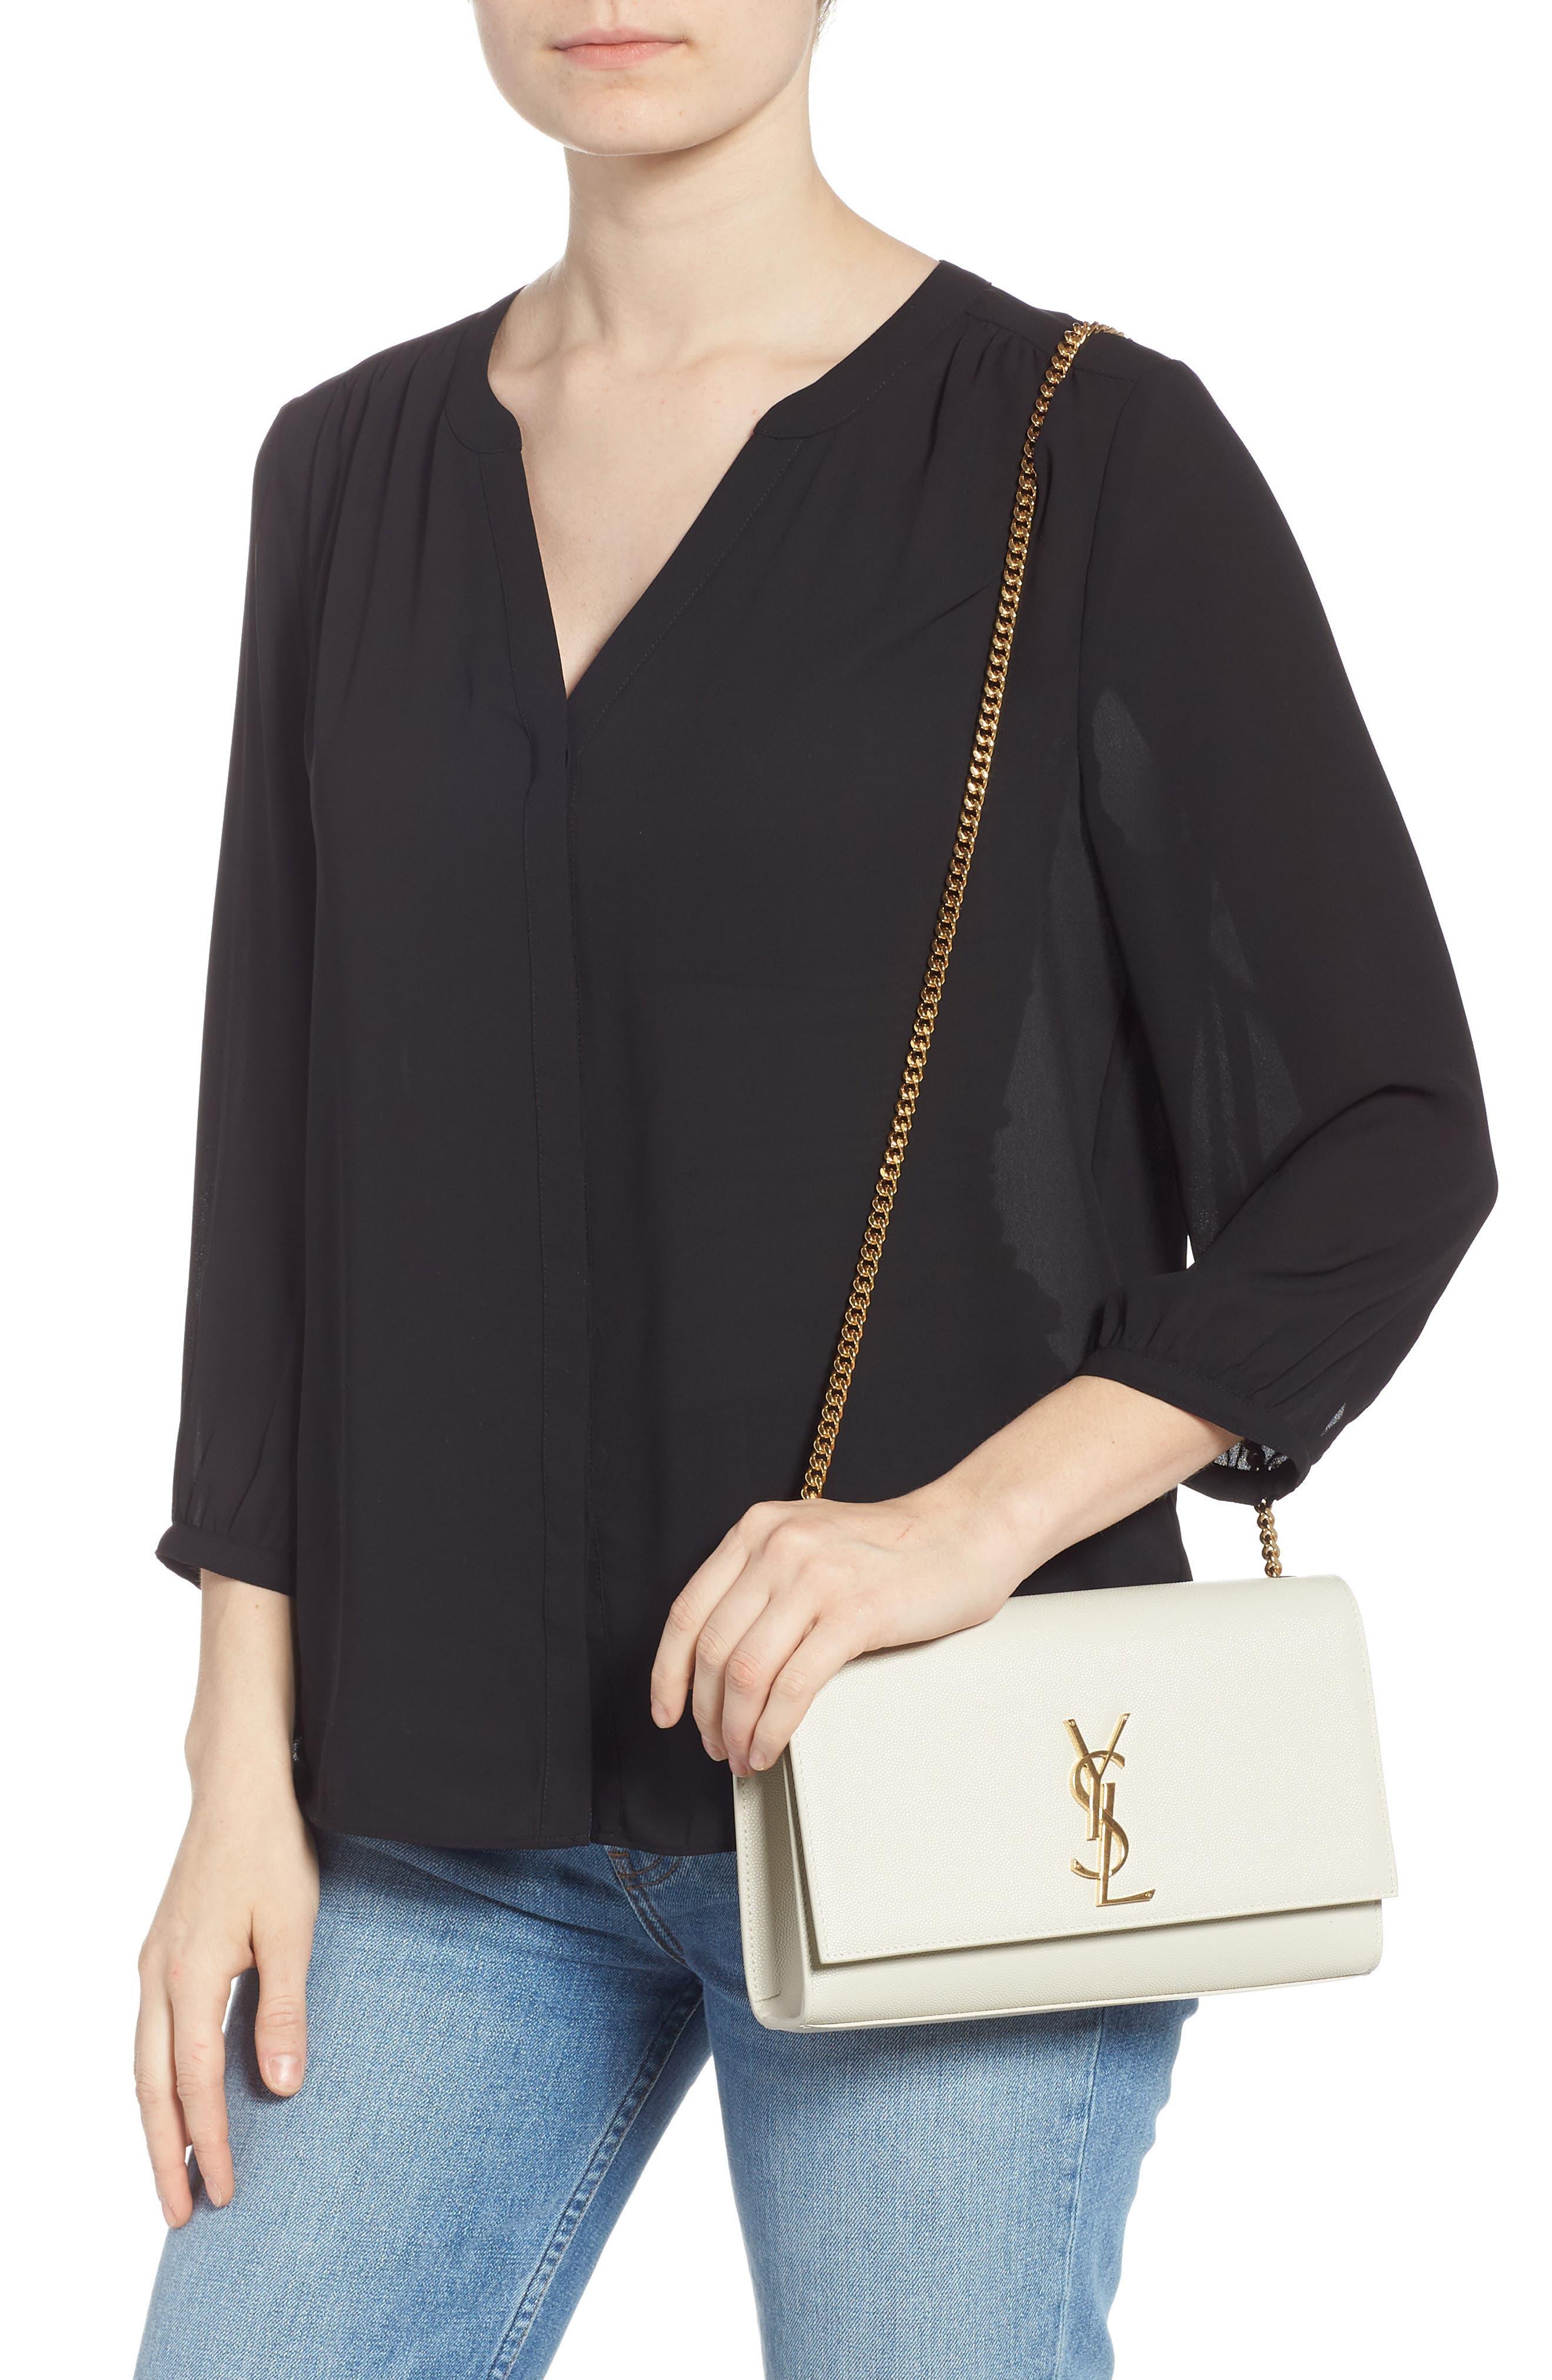 'Medium Kate' Leather Chain Shoulder Bag,                             Alternate thumbnail 2, color,                             CREMASOFT